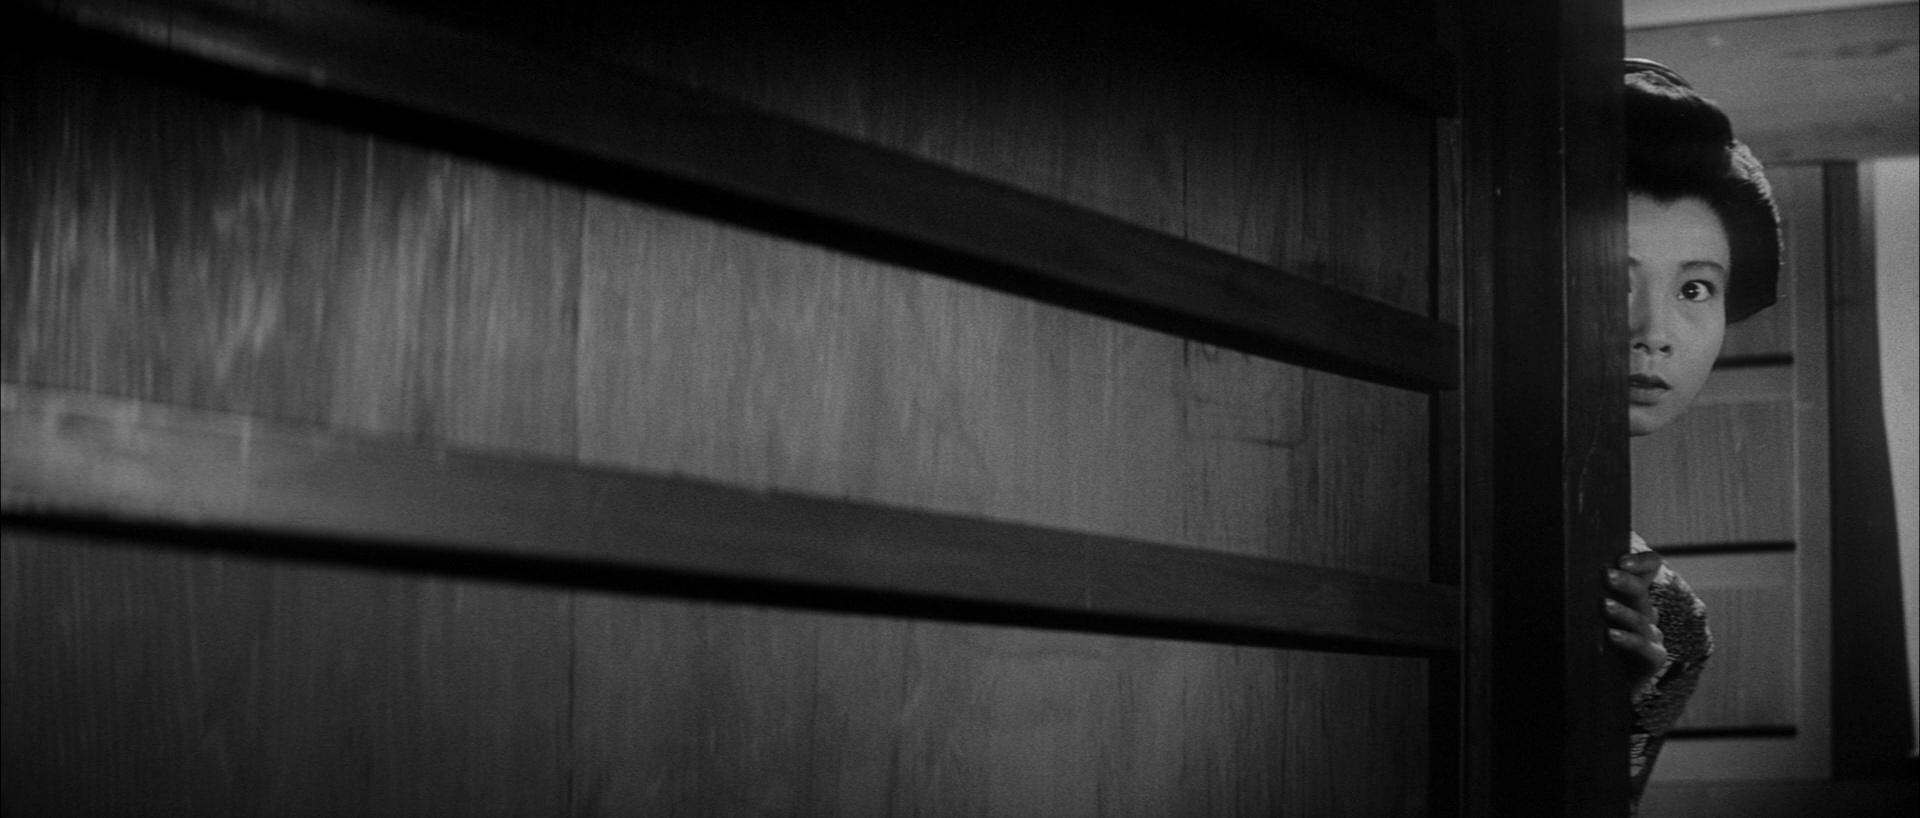 Galerie Trois samouraïs hors-la-loi 3